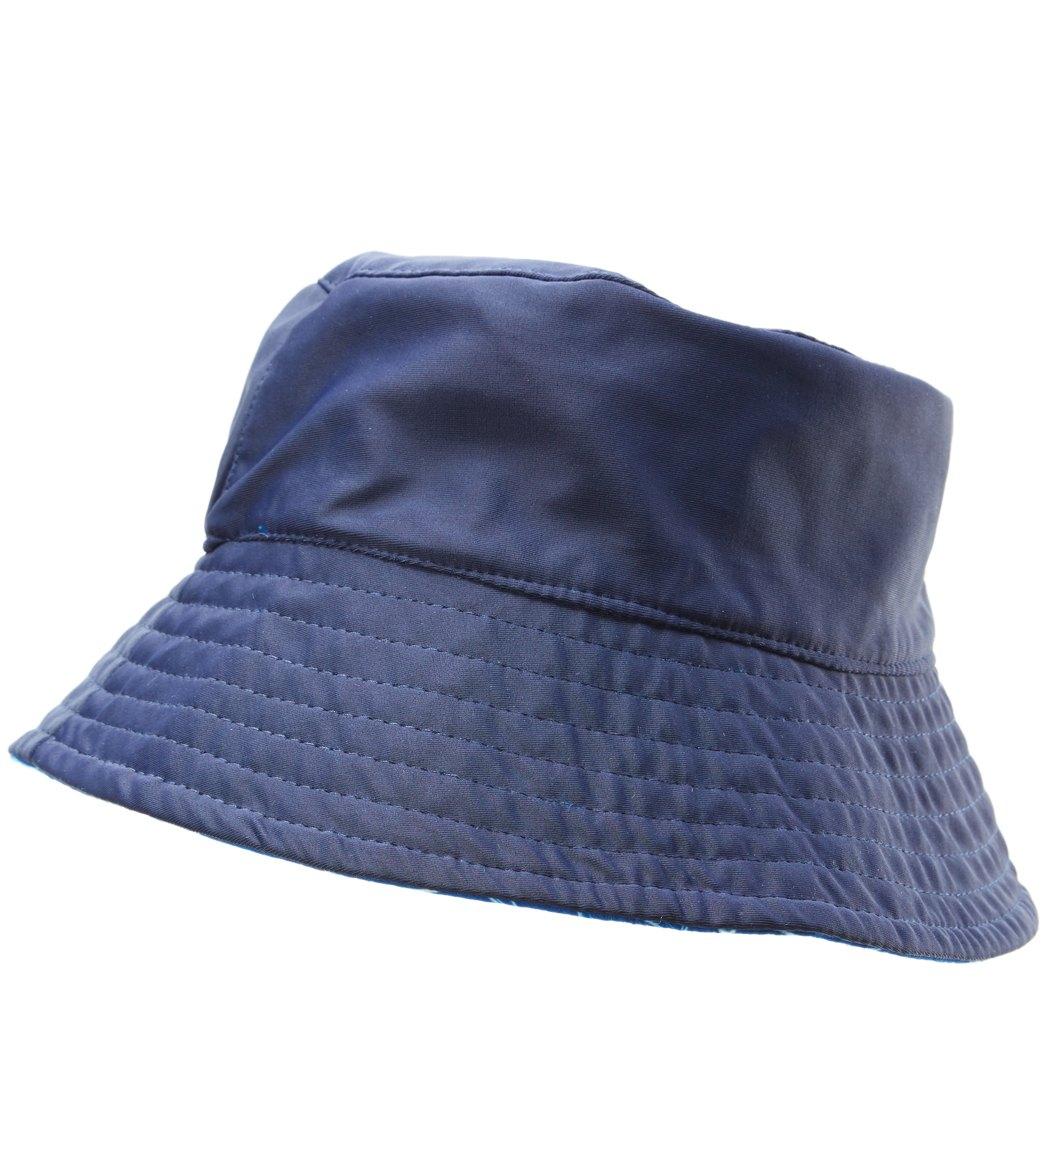 Sporti Infant Boys  UPF 50+ Bucket Hat at SwimOutlet.com 468a34a66d1